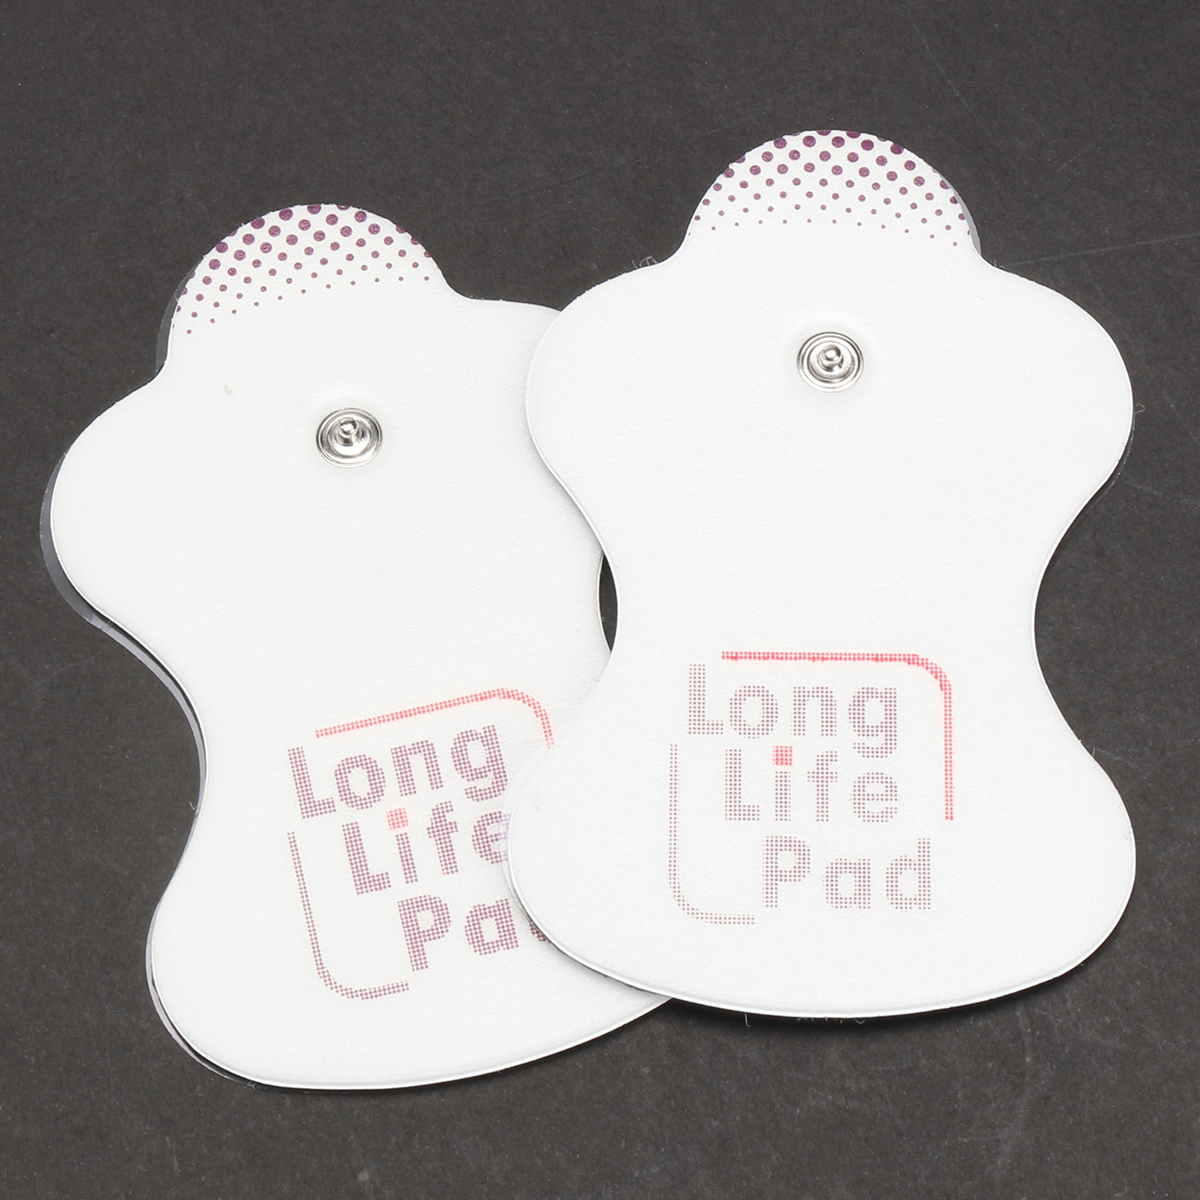 12PCS Elektrode Ersatz Pads Digitale Therapie Maschine Halswirbel Physiotherapie Körper Abnehmen Massage